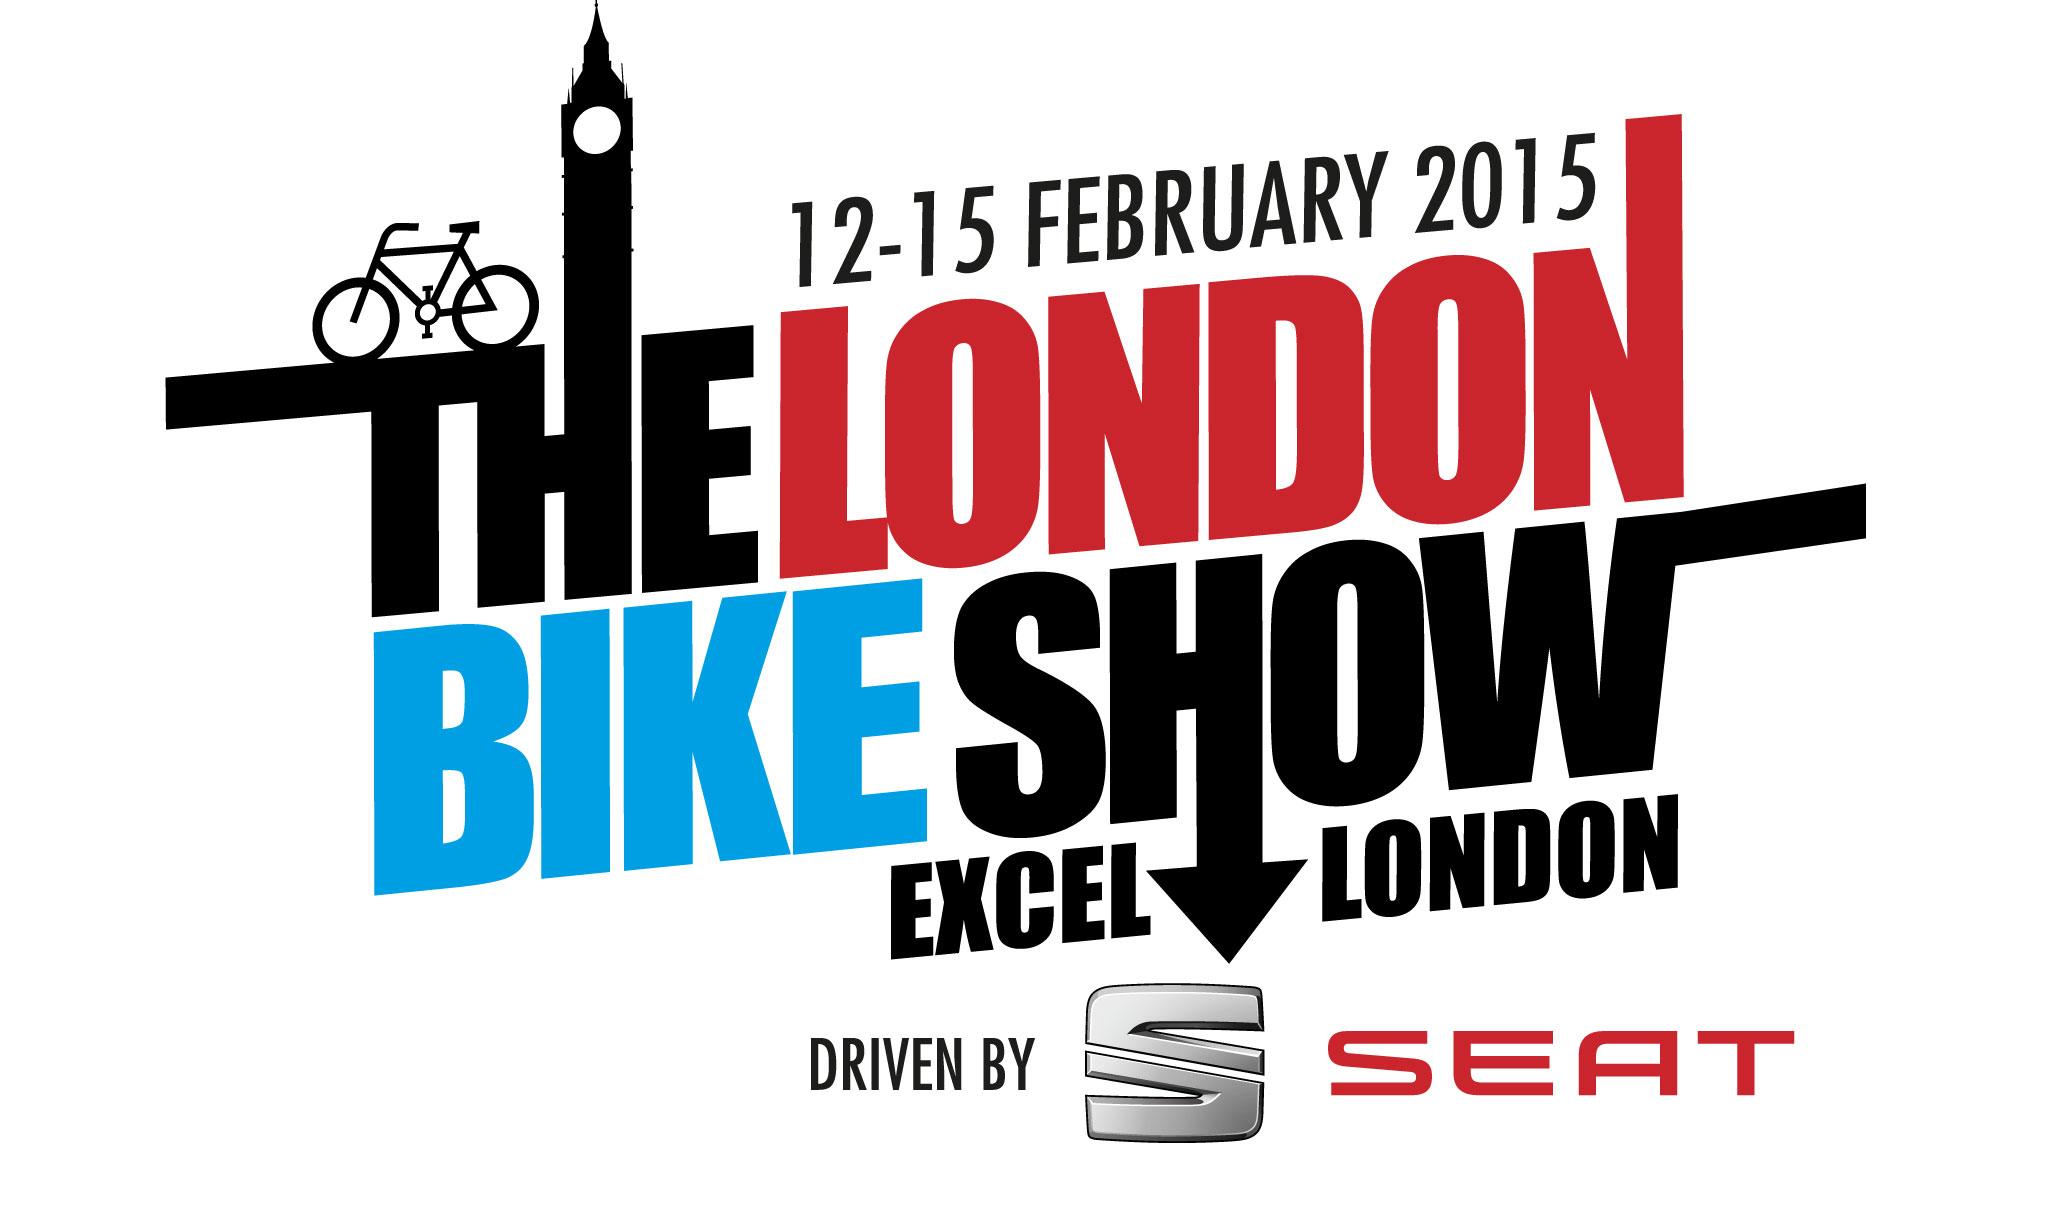 London Bike Show - Electric bike event